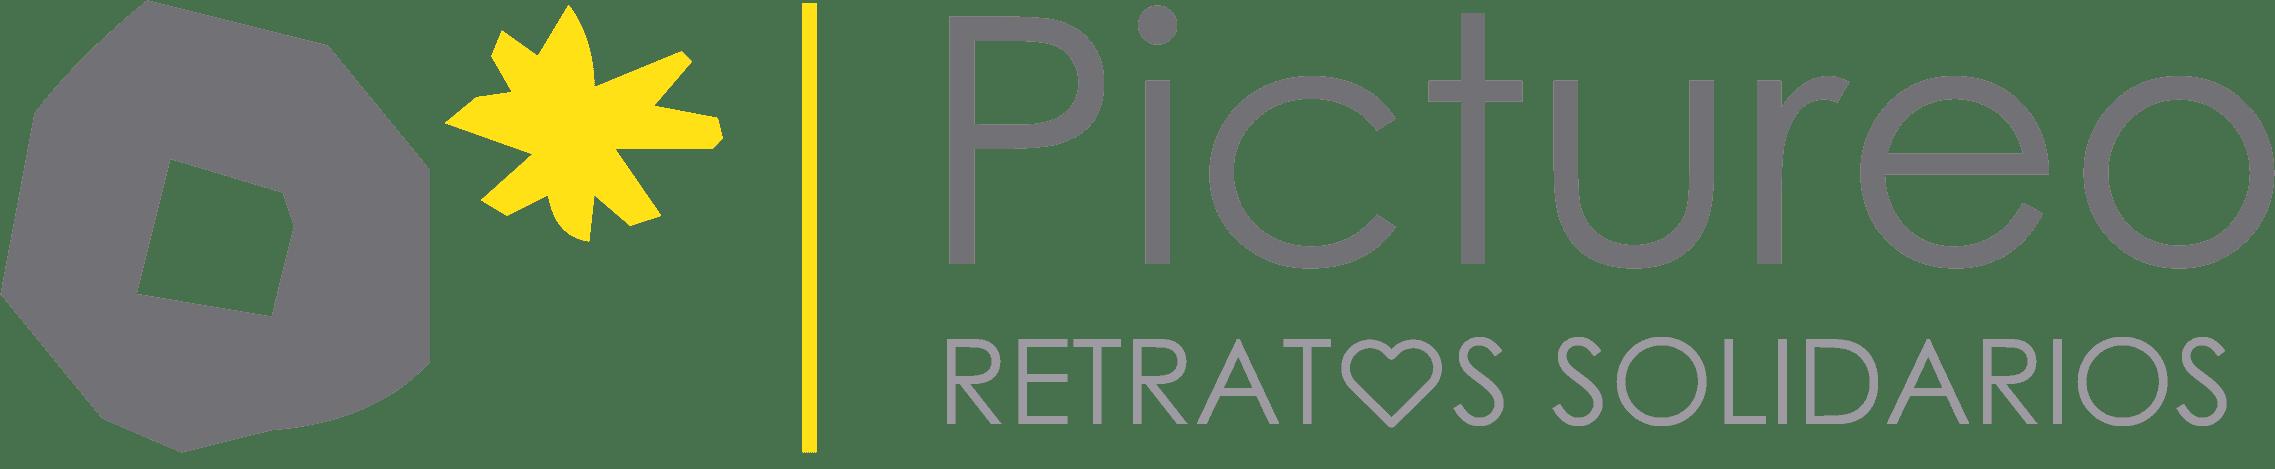 pictureo-logo-retrato-solidario